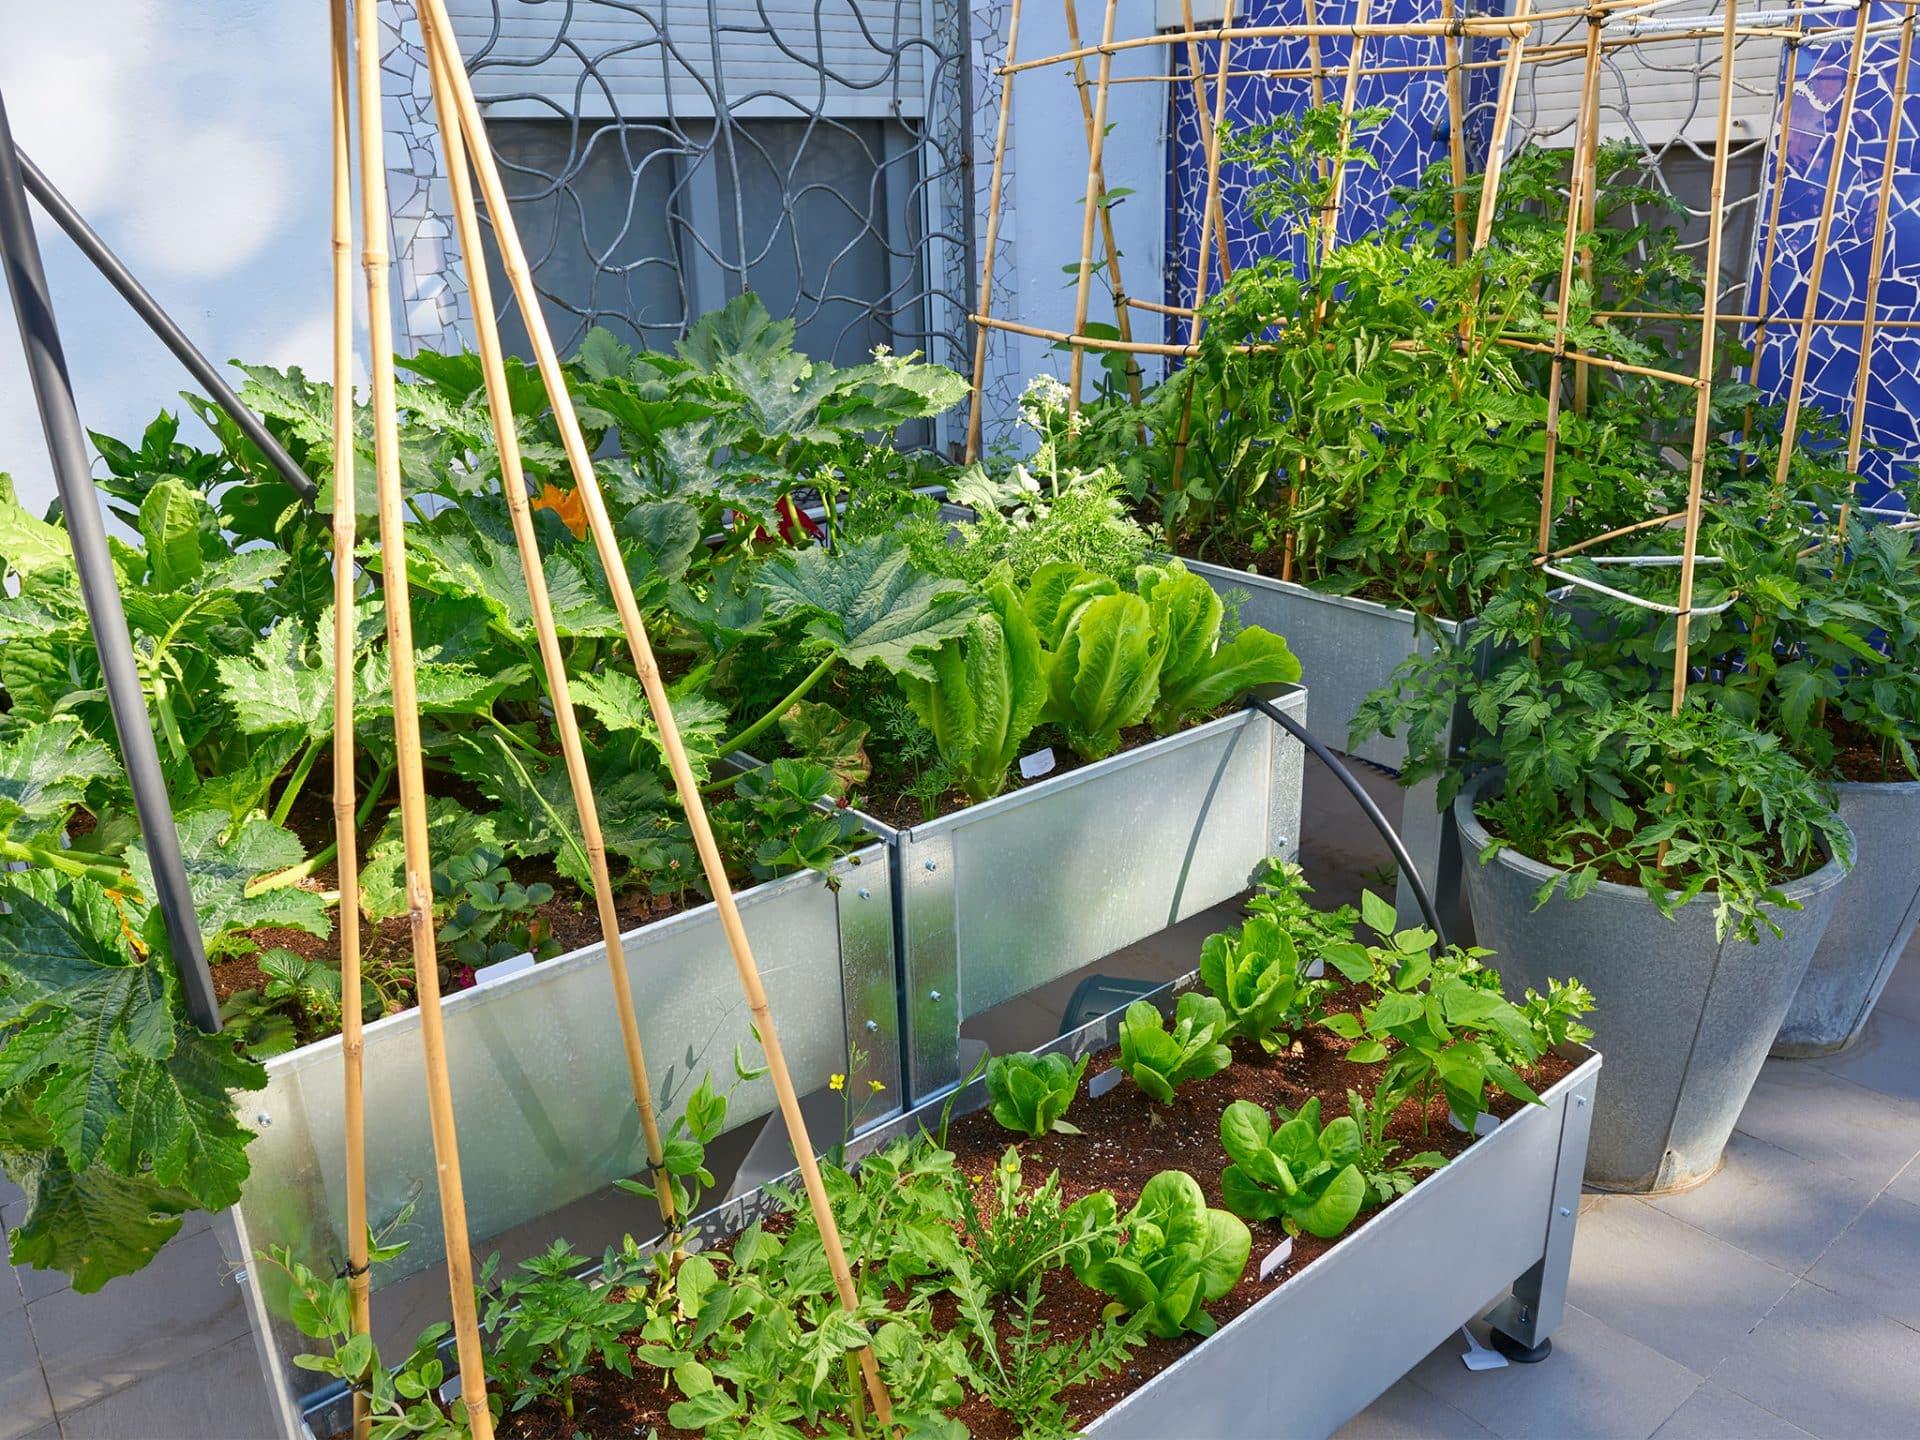 hochbeet_metall_urban_gardening_gemuese